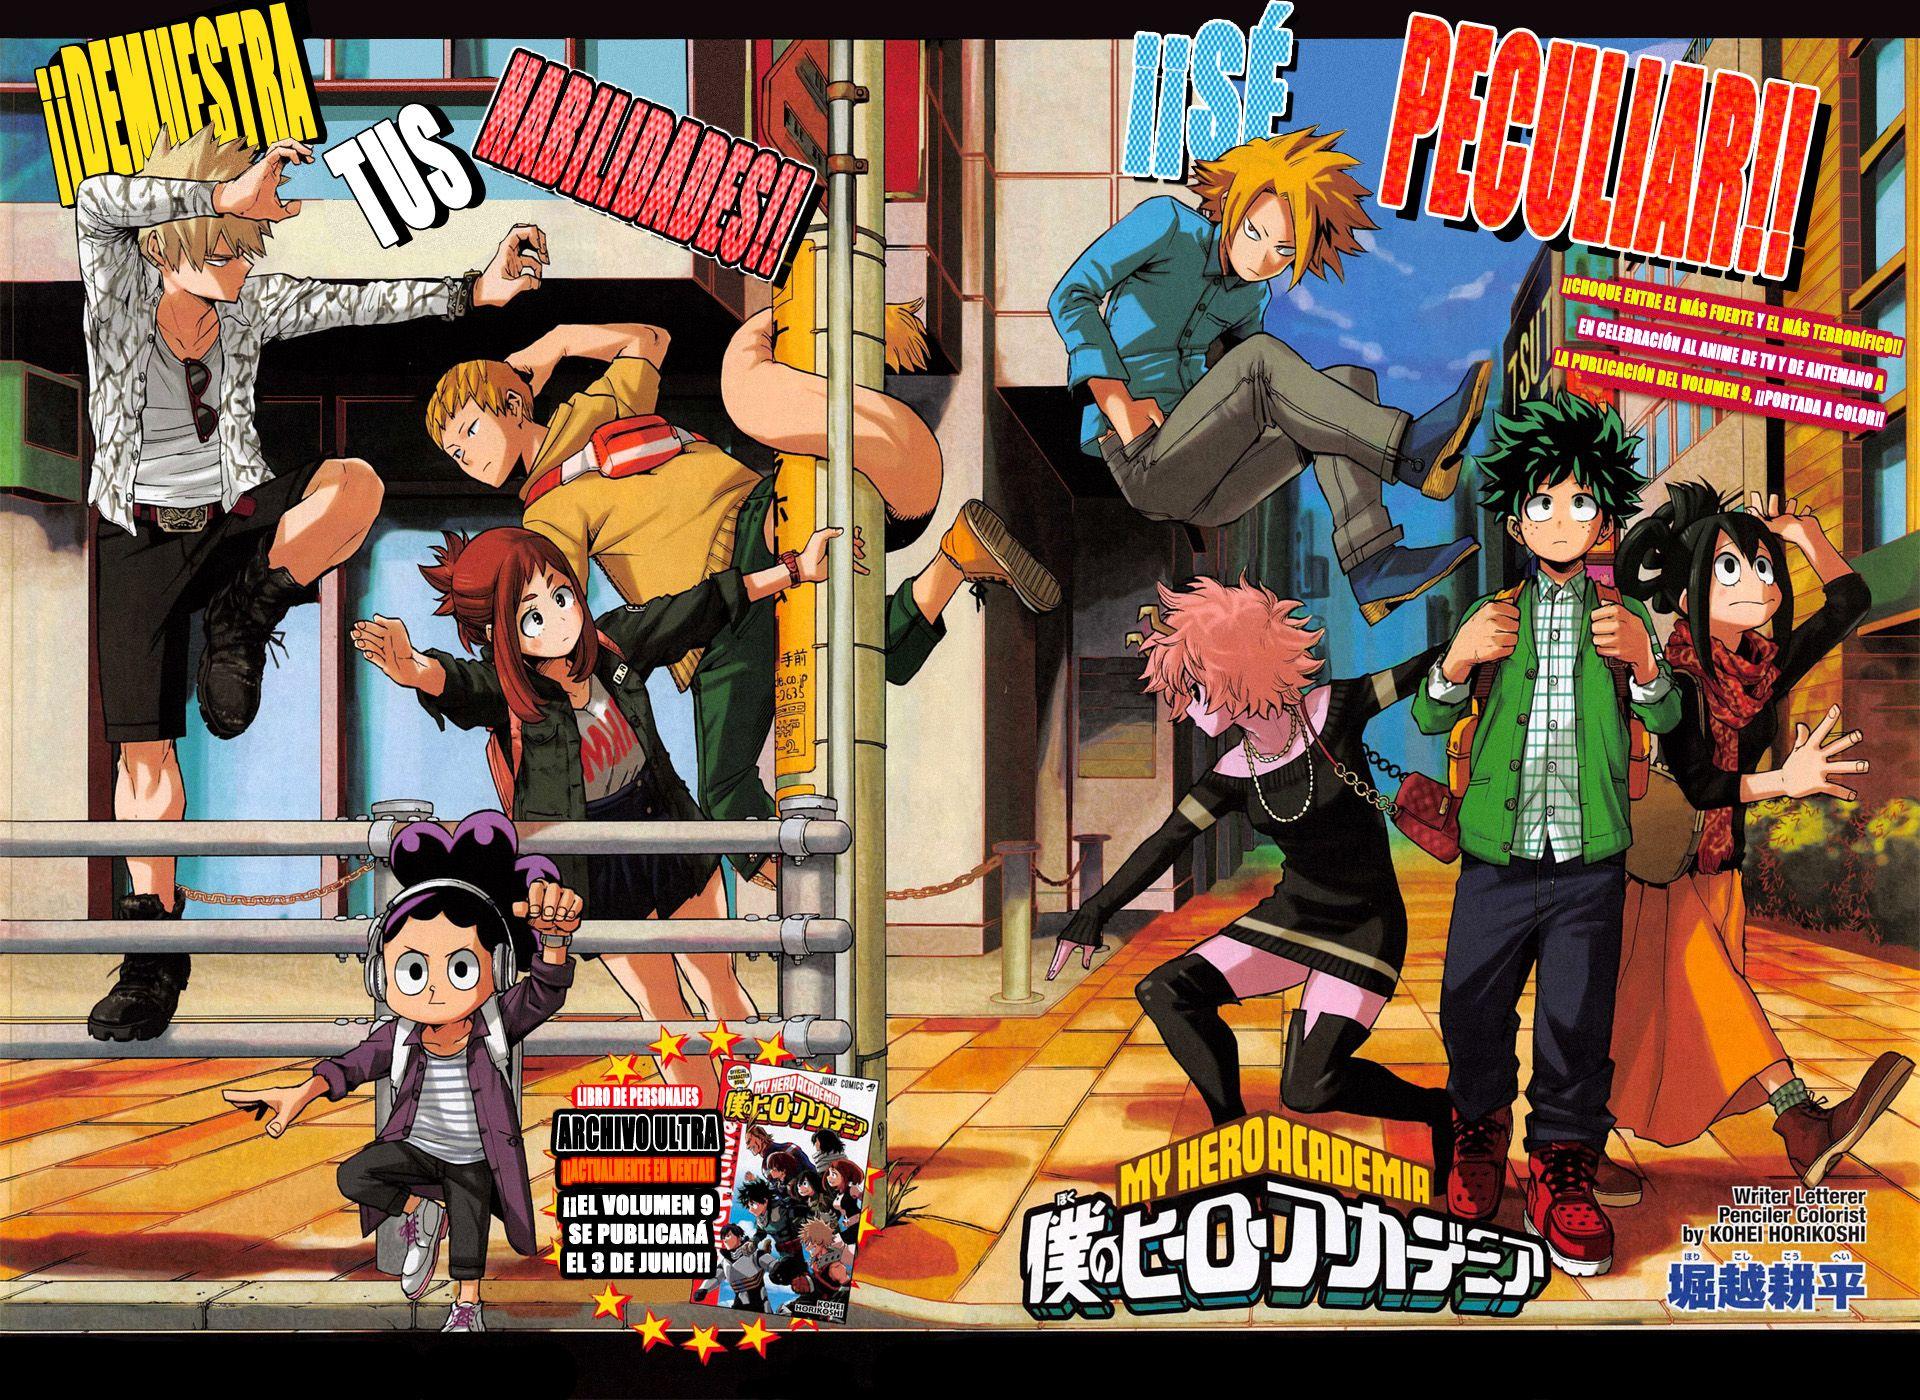 http://c5.ninemanga.com/es_manga/54/182/464542/e2c75fdd8ccb9ac60cd627d3fc1aafa4.jpg Page 4